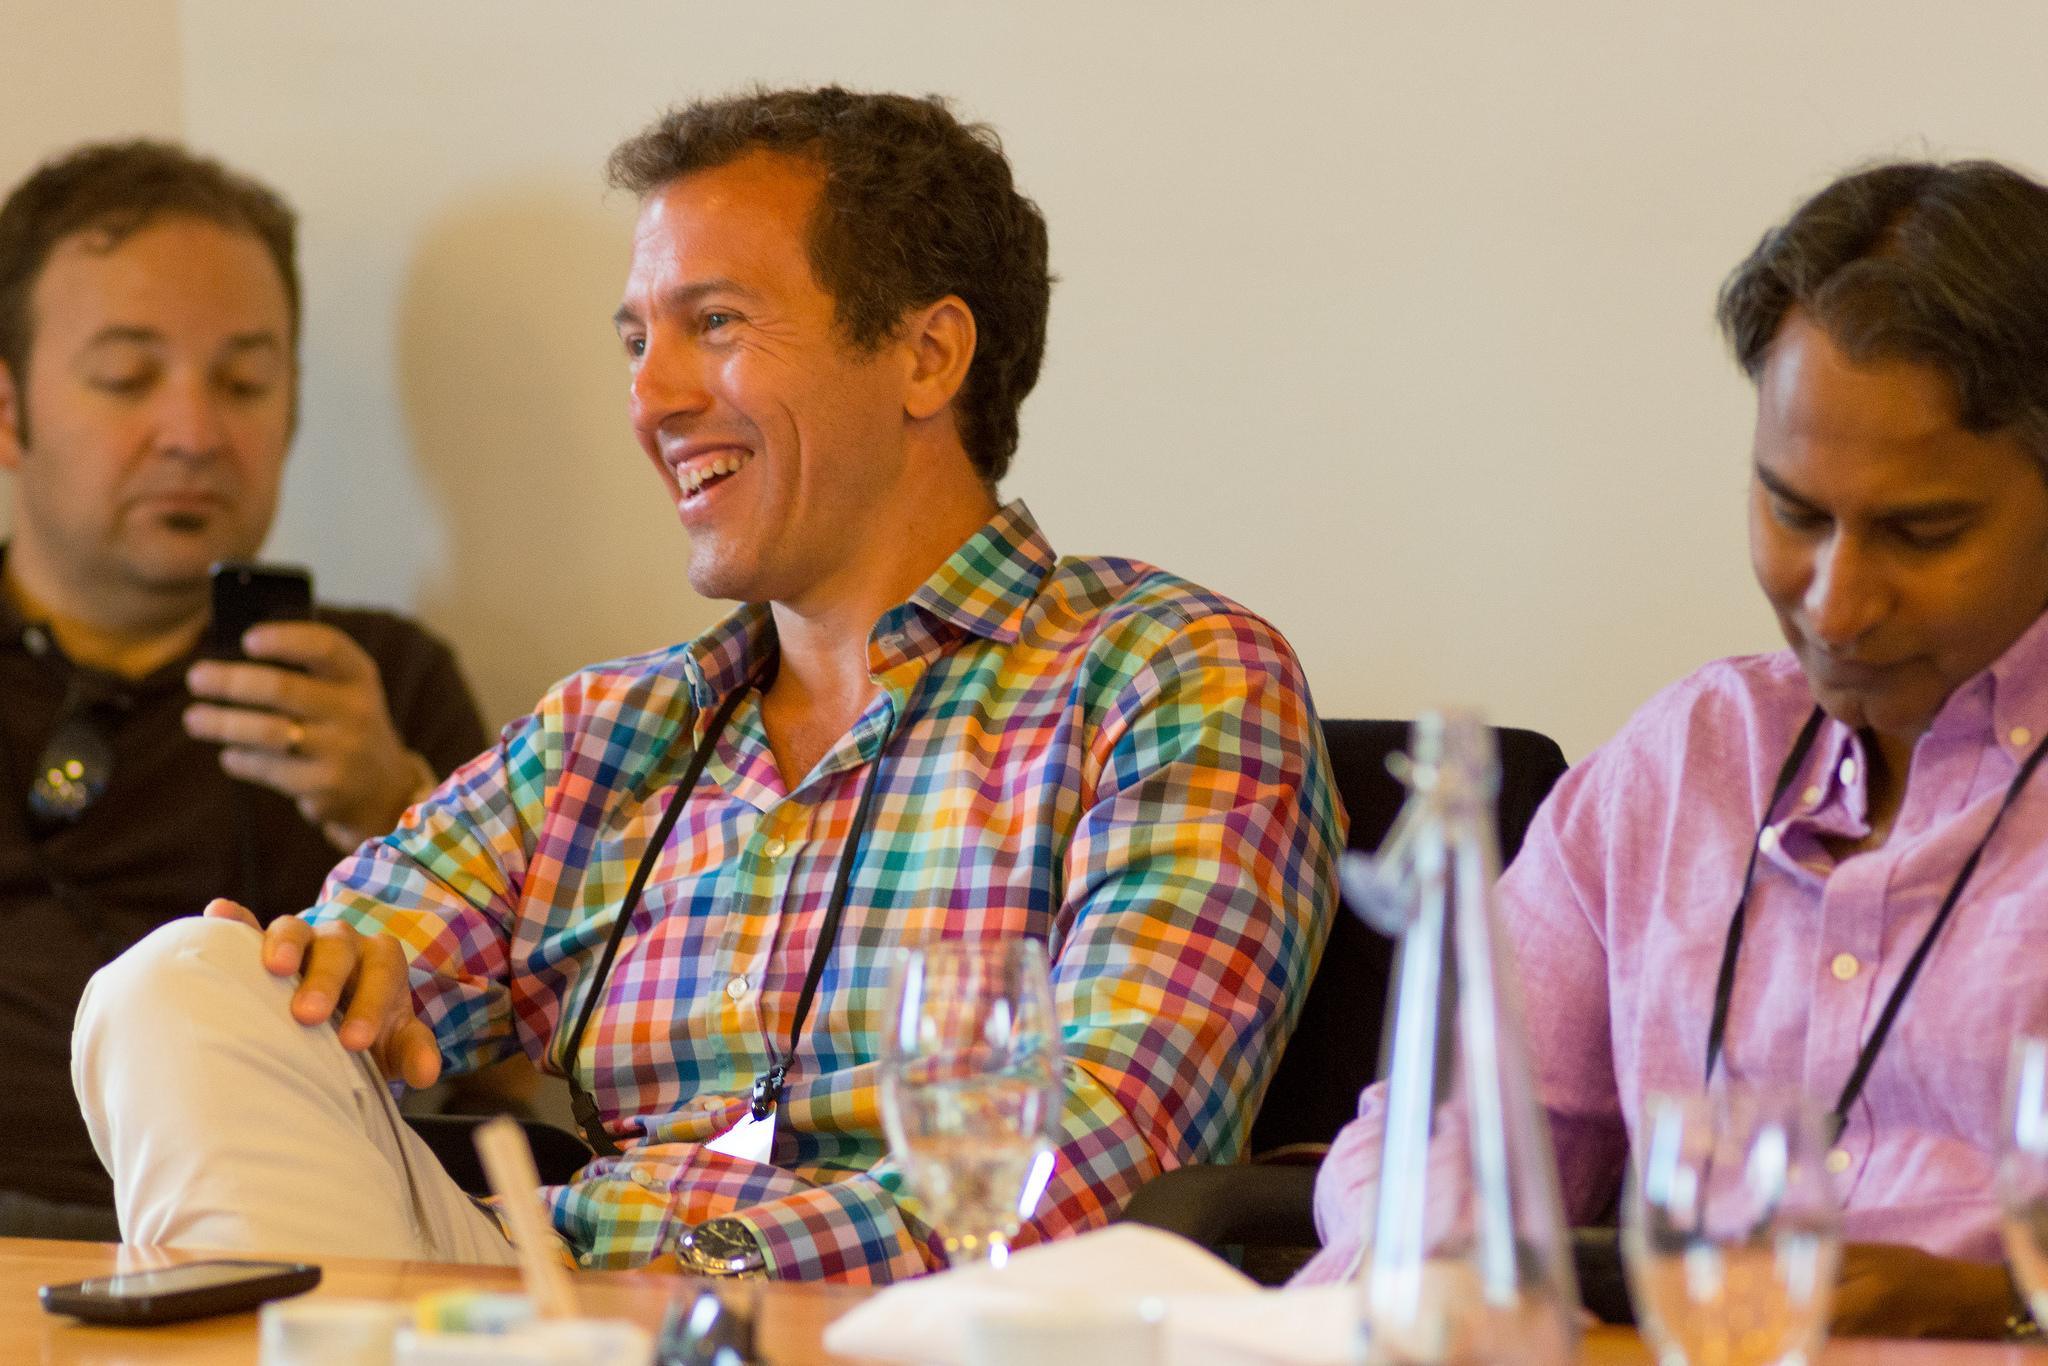 Confide co-founder Jon Brod at 2014 Fortune Brainstorm Tech